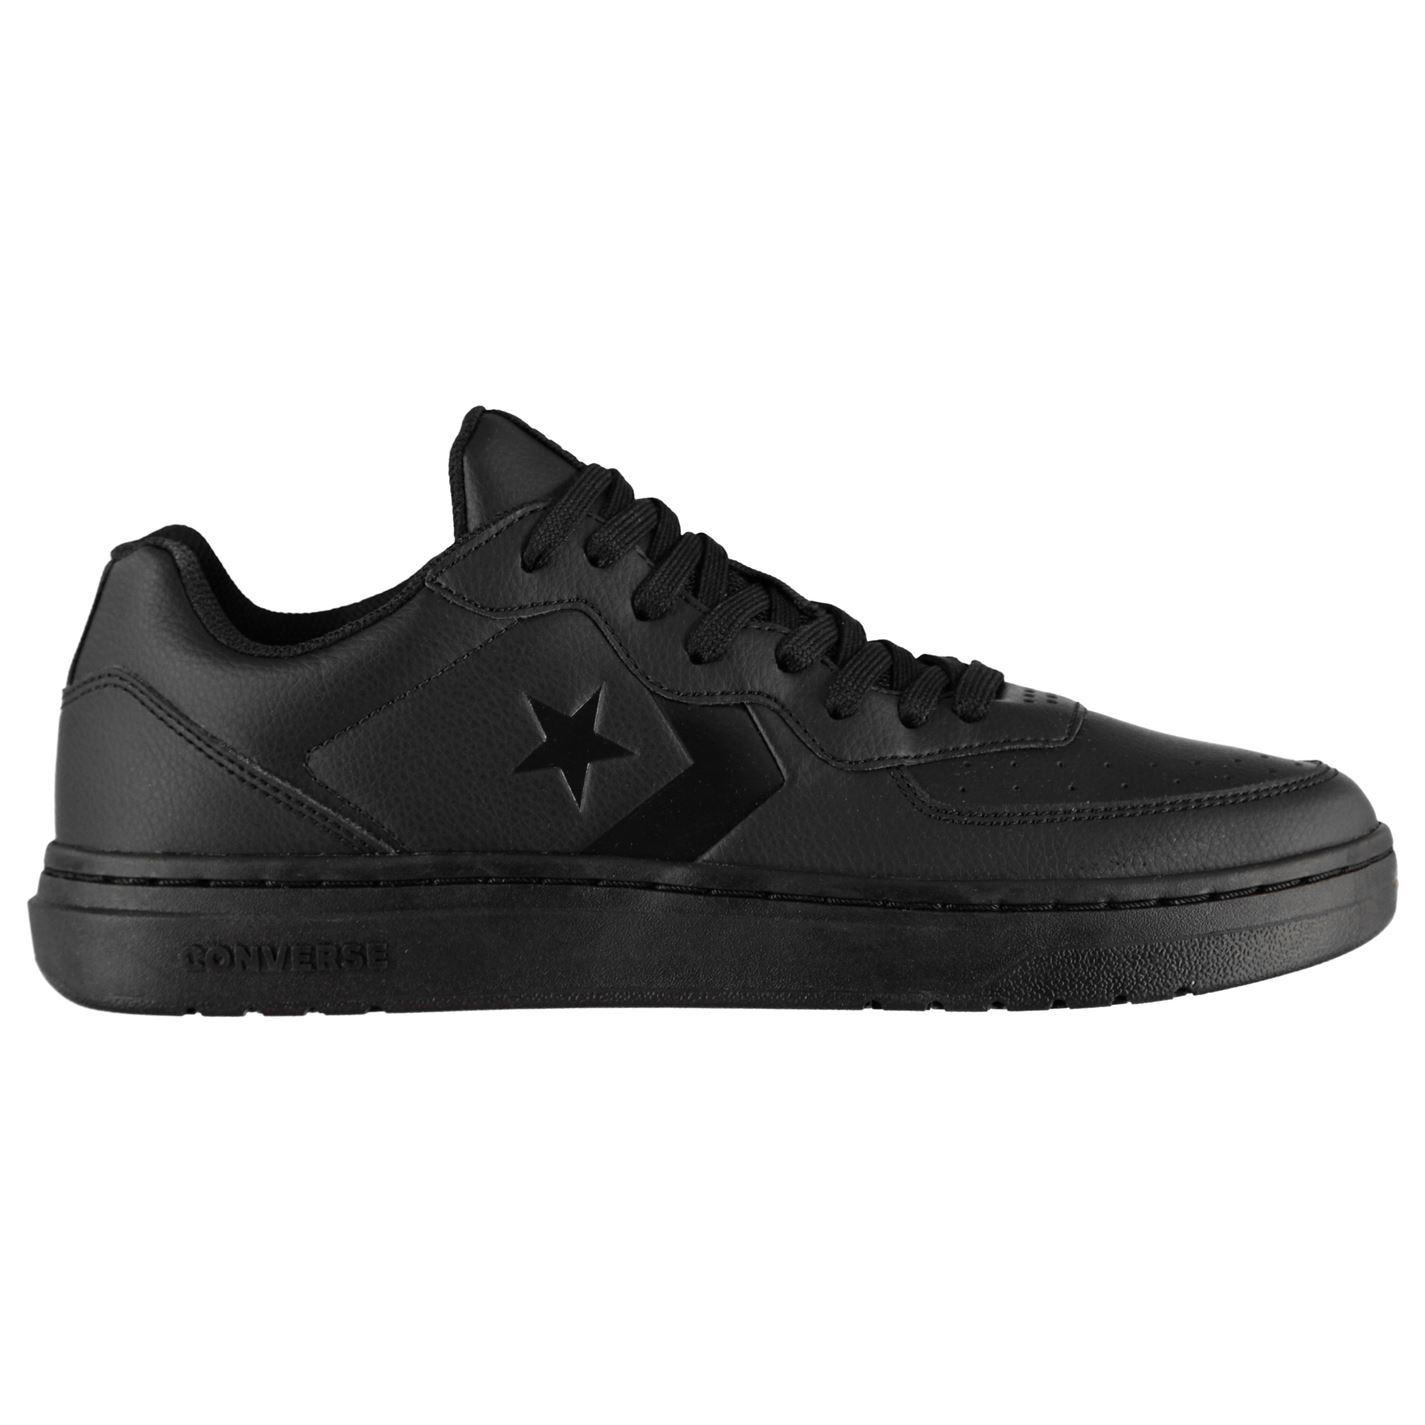 Converse-Ox-Rival-Cuir-Baskets-Pour-Homme-Chaussures-De-Loisirs-Chaussures-Baskets miniature 8